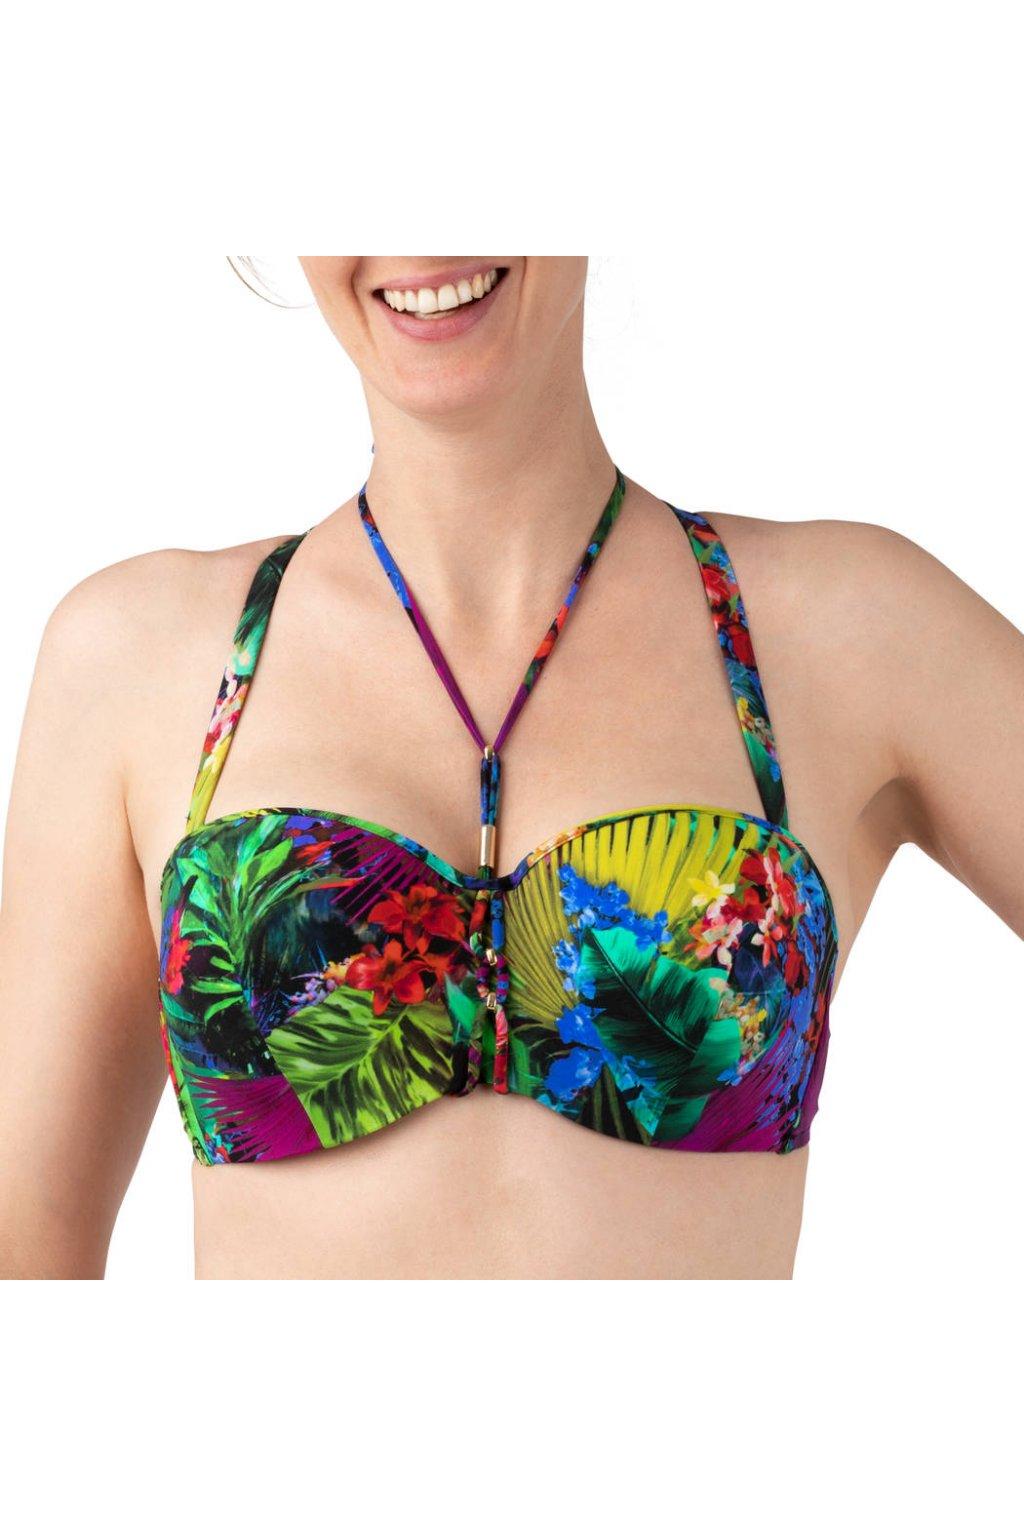 maillot de bain lise charmel sublime amazone multicolore